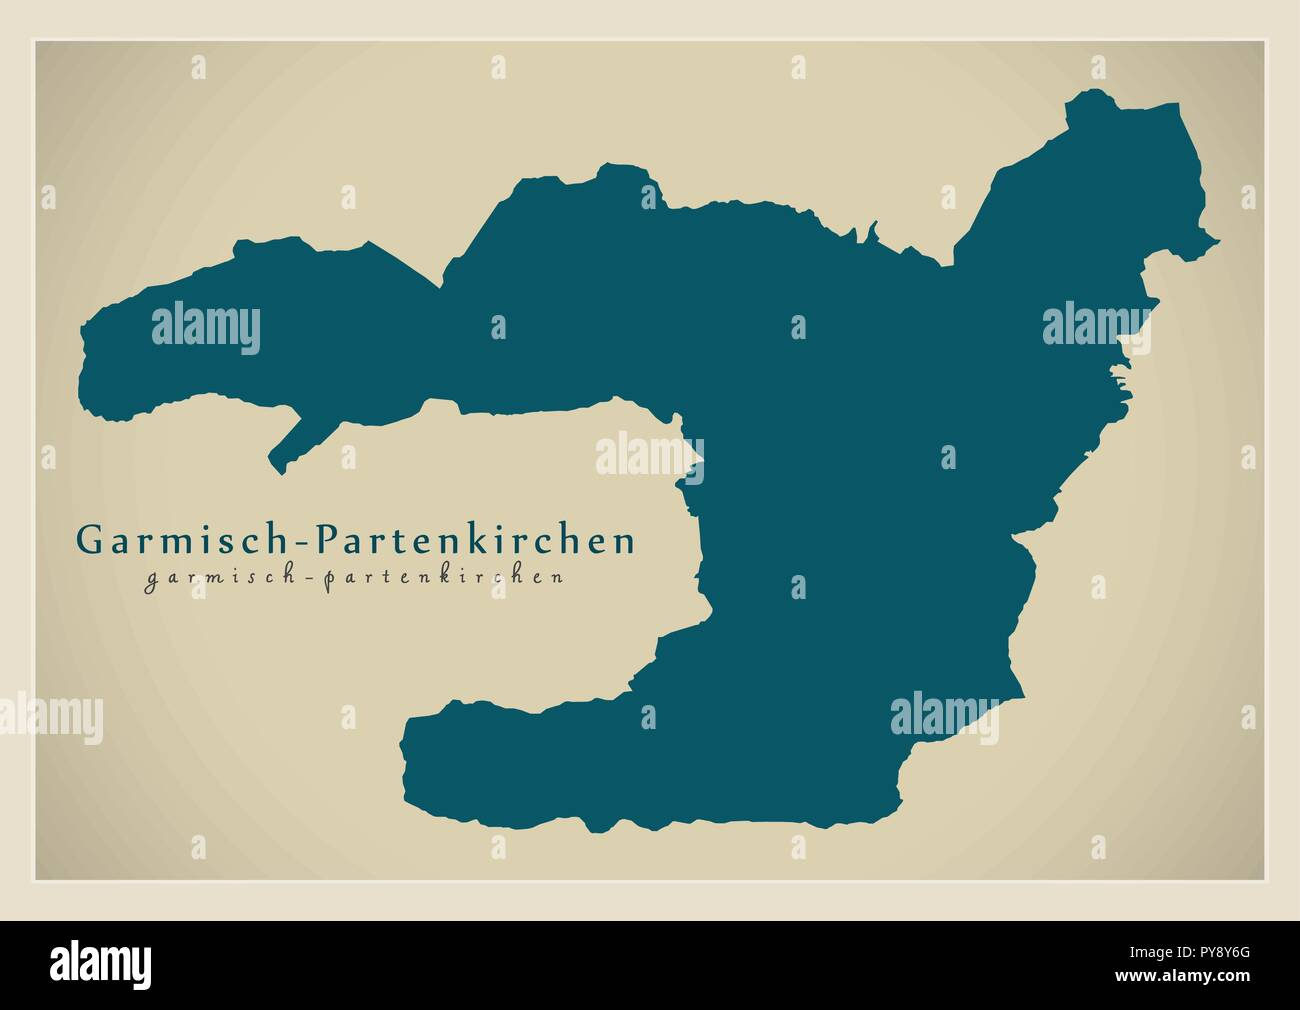 Garmisch Partenkirchen Administration Area Map Germany Stock Vector